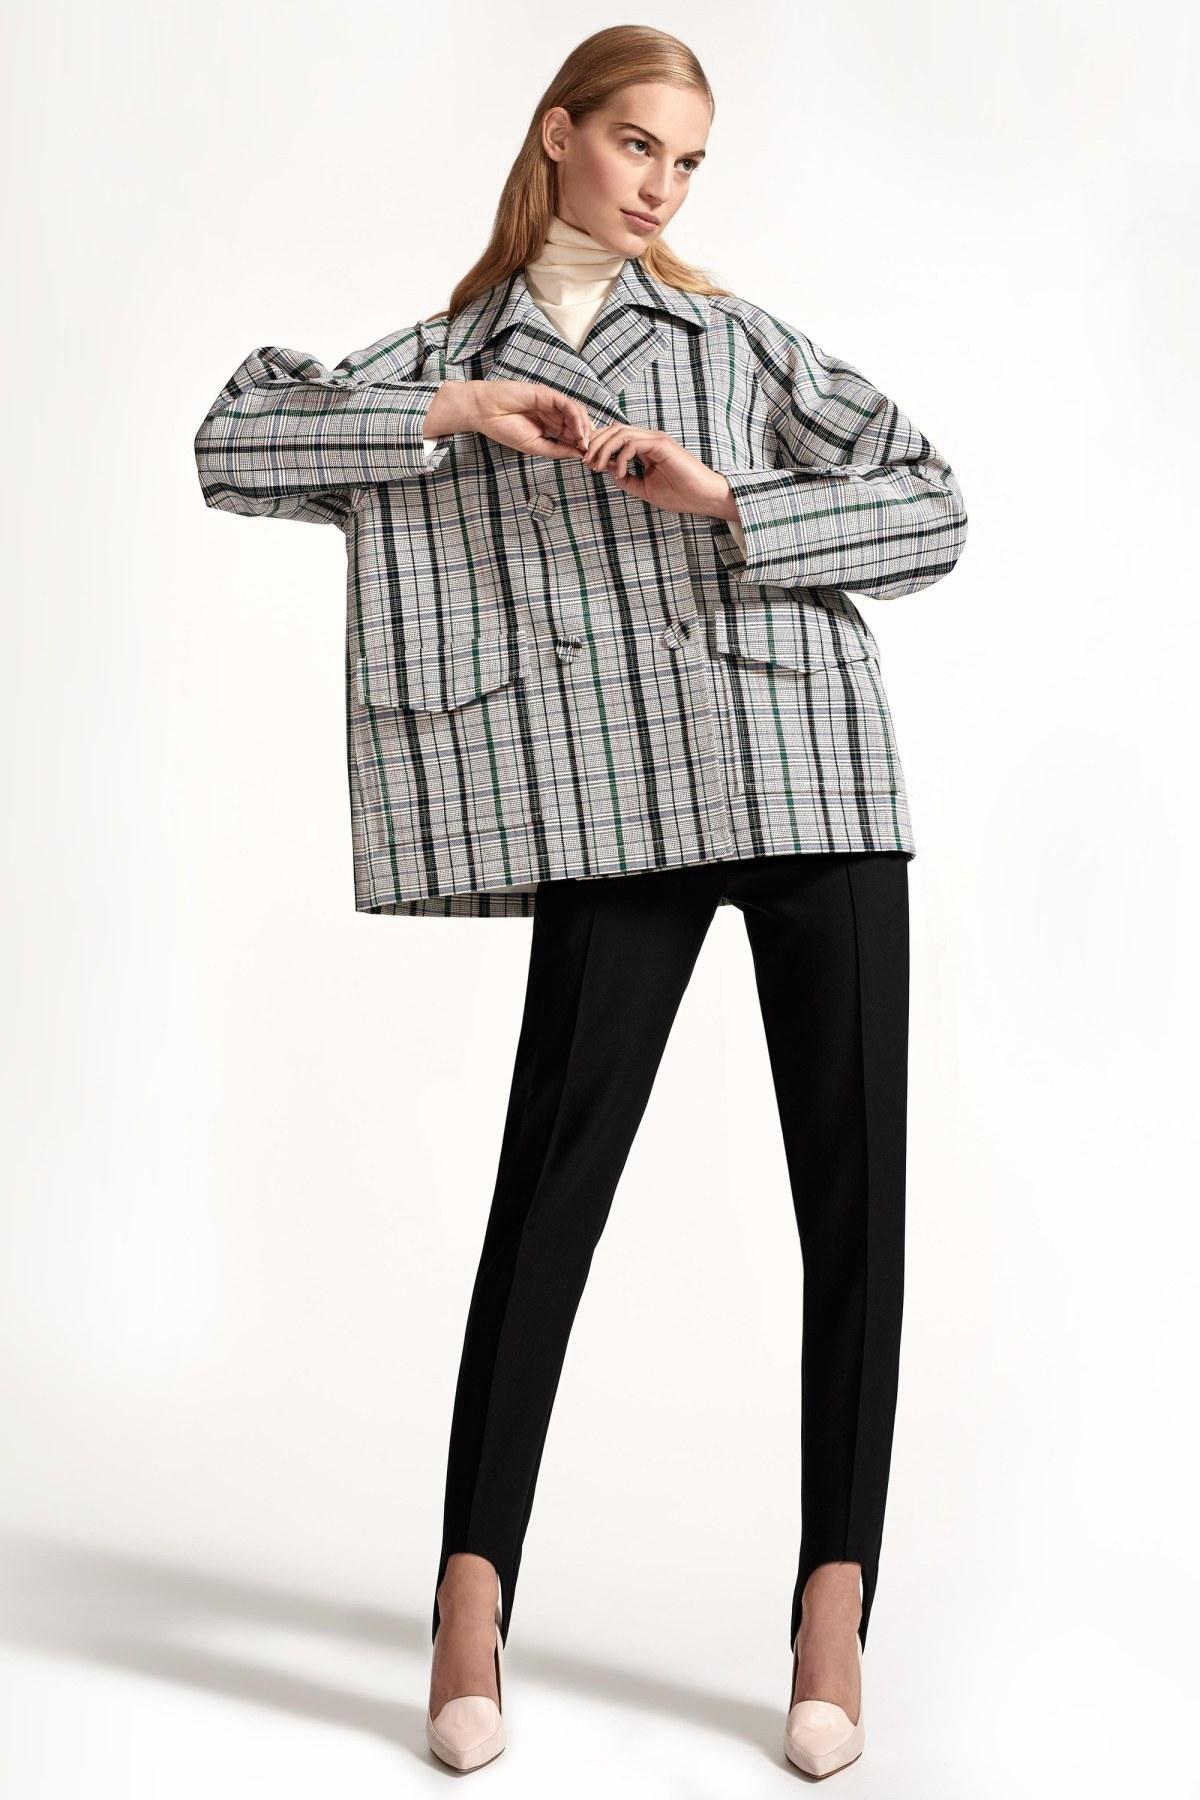 protagonist-pre-fall-2017-fashion-show-the-impression-08